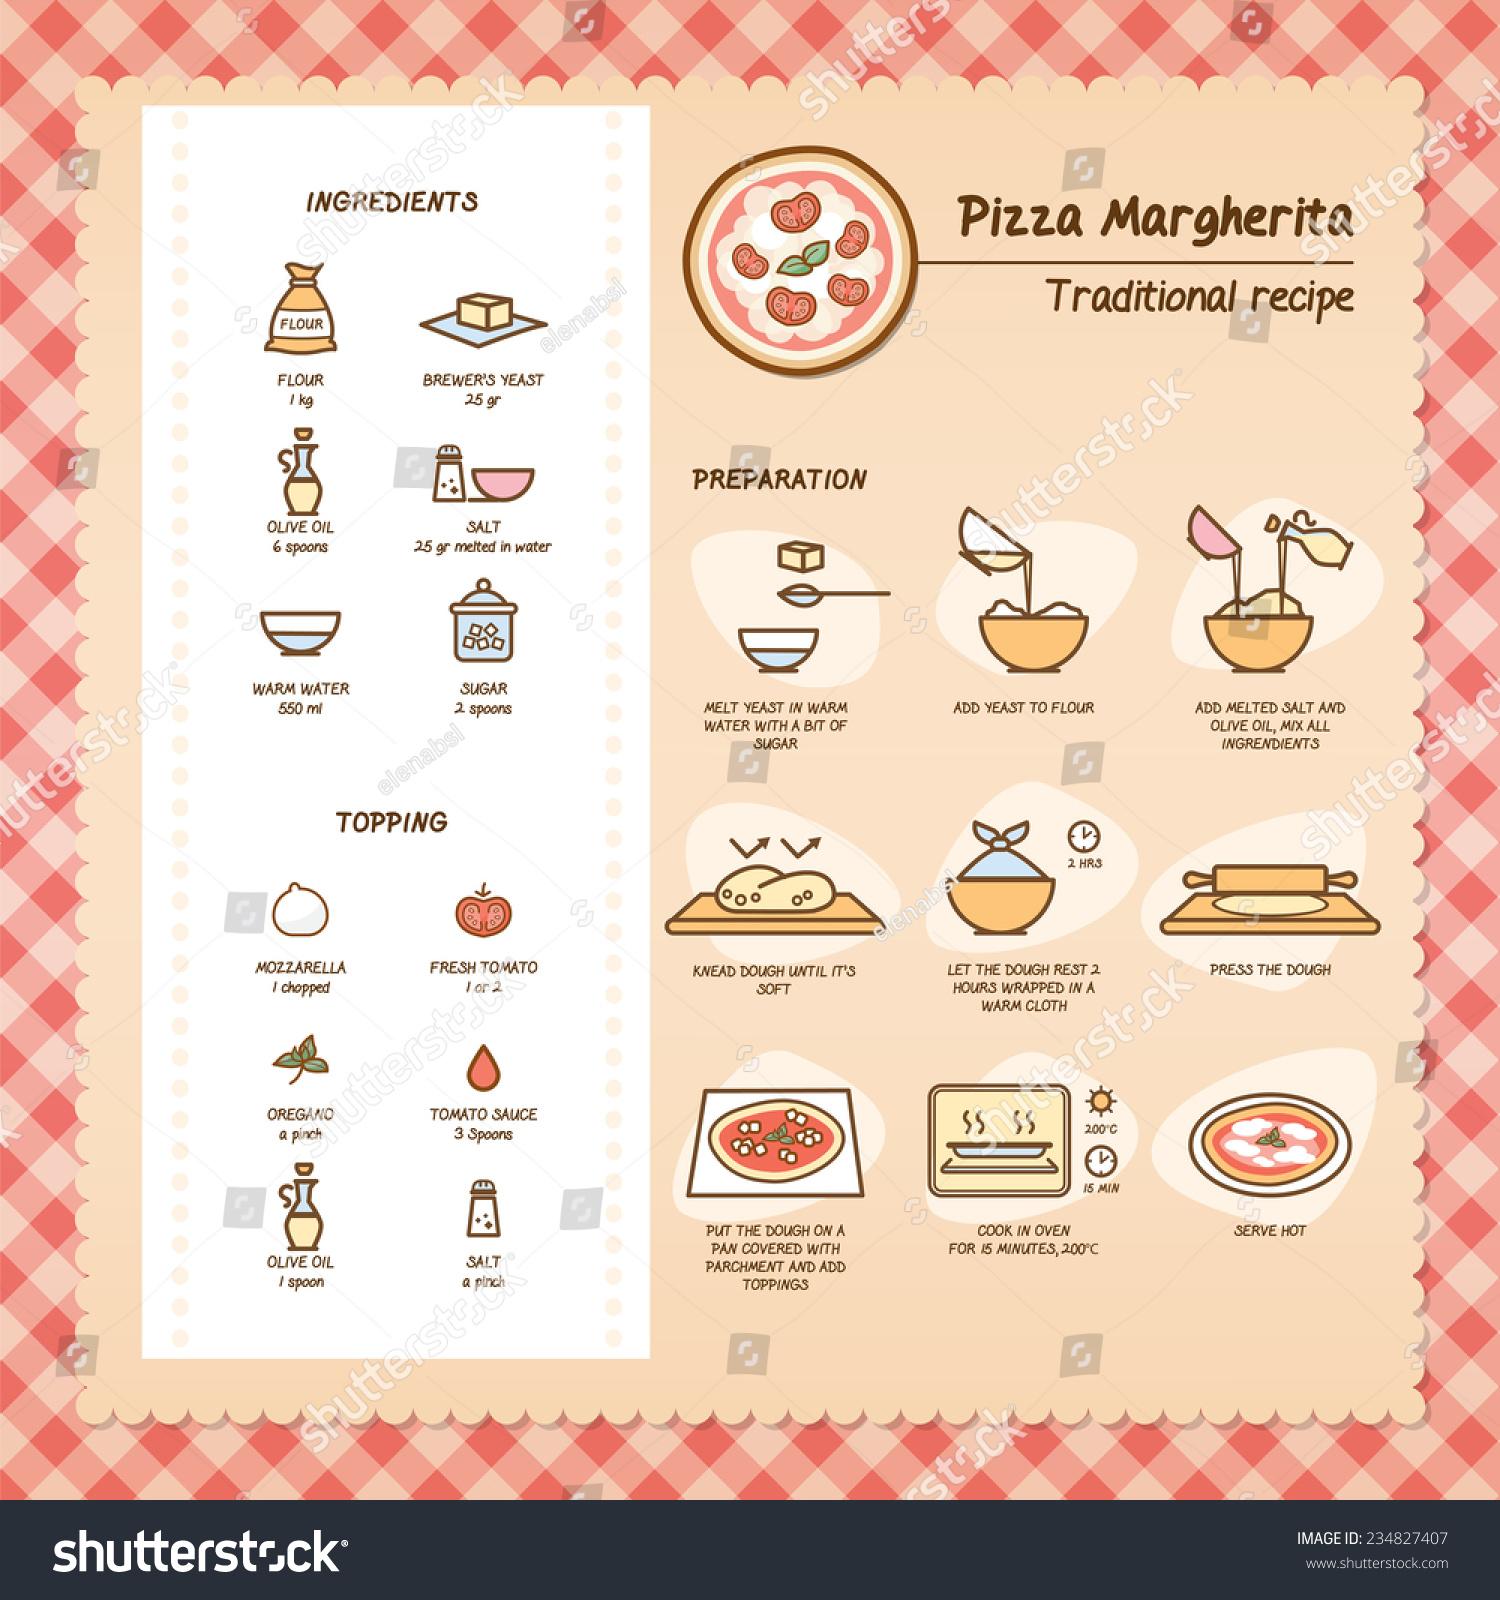 Stock Vector Pizza Margherita